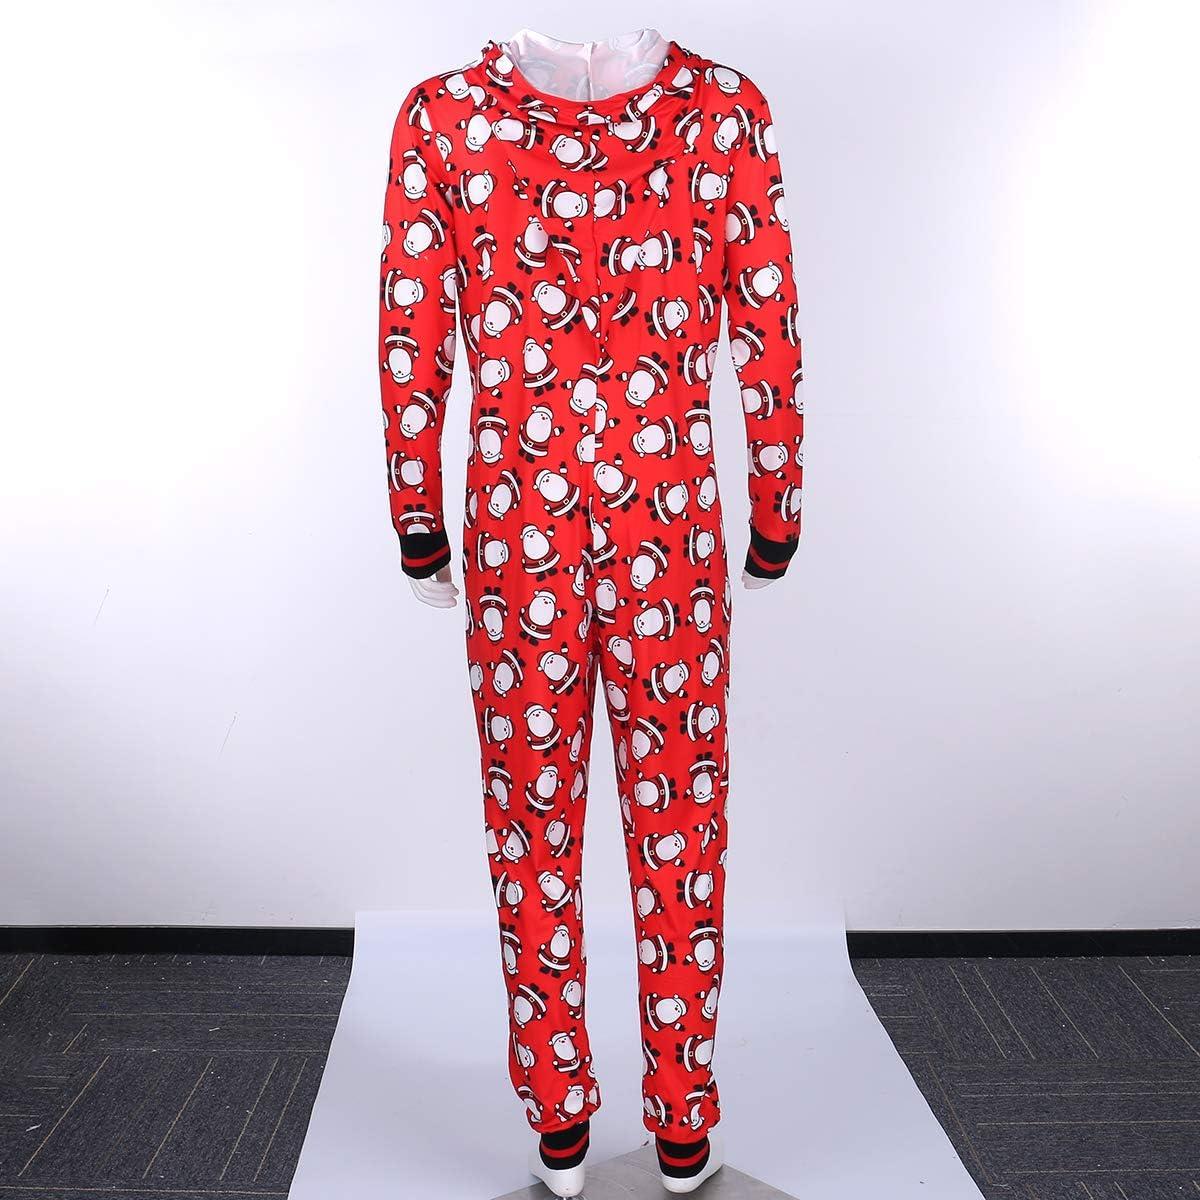 Matching Family Pajamas Set, Christmas Santa Printed Long Sleeve Hooded Romper + Zipper Pants Sleepwear